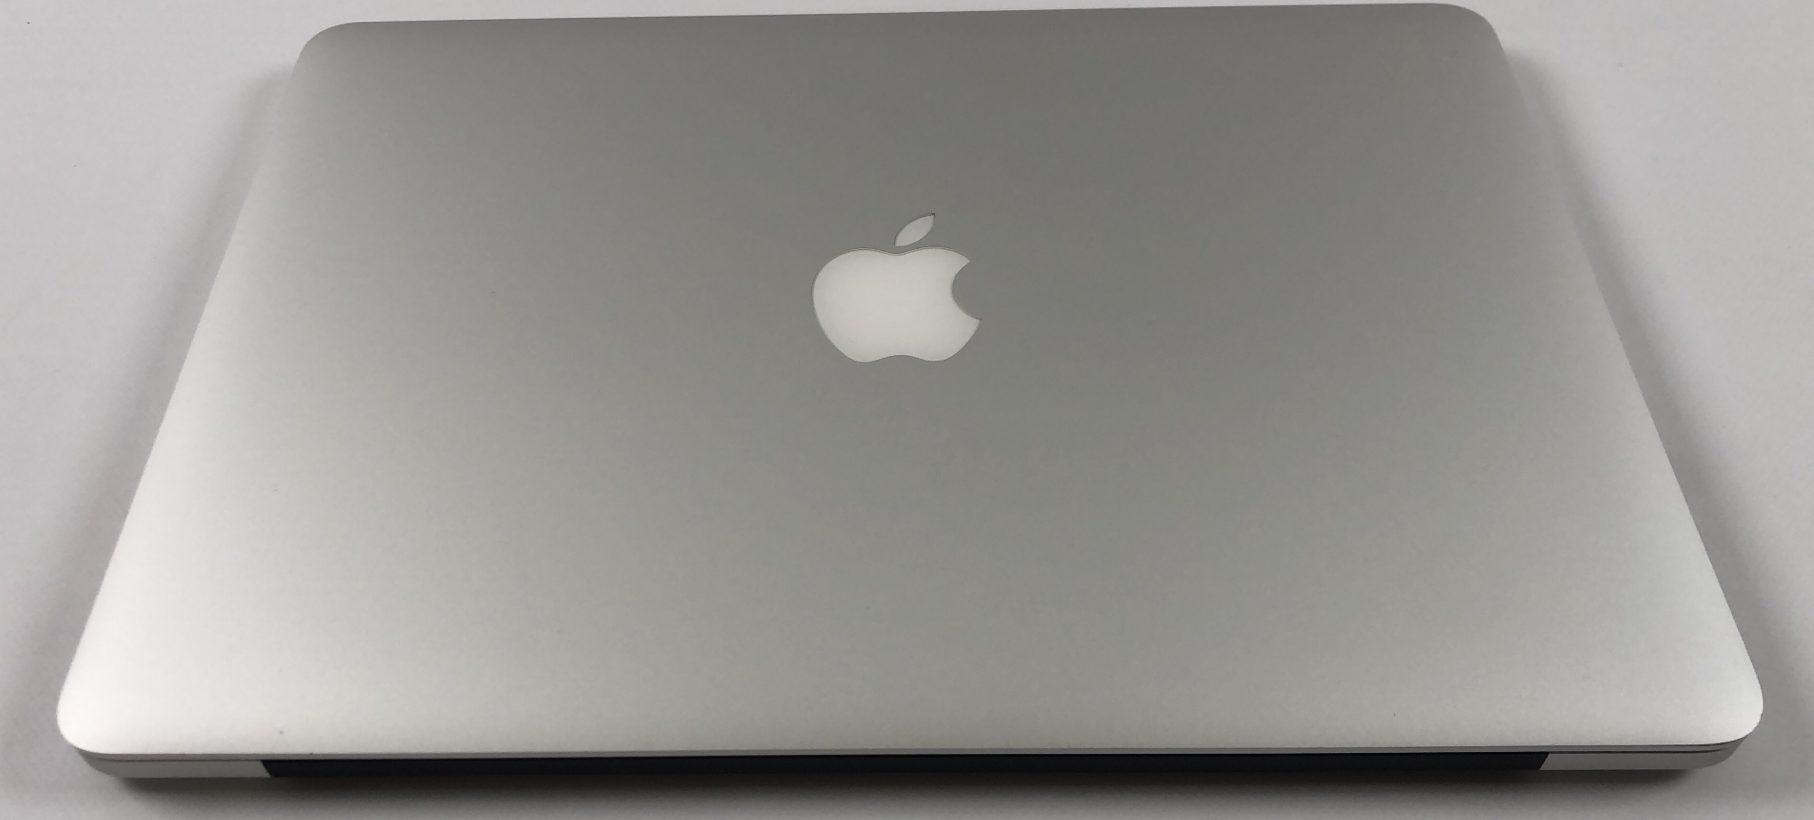 "MacBook Pro Retina 13"" Early 2015 (Intel Core i5 2.7 GHz 16 GB RAM 256 GB SSD), Intel Core i5 2.7 GHz, 16 GB RAM, 256 GB SSD, image 2"